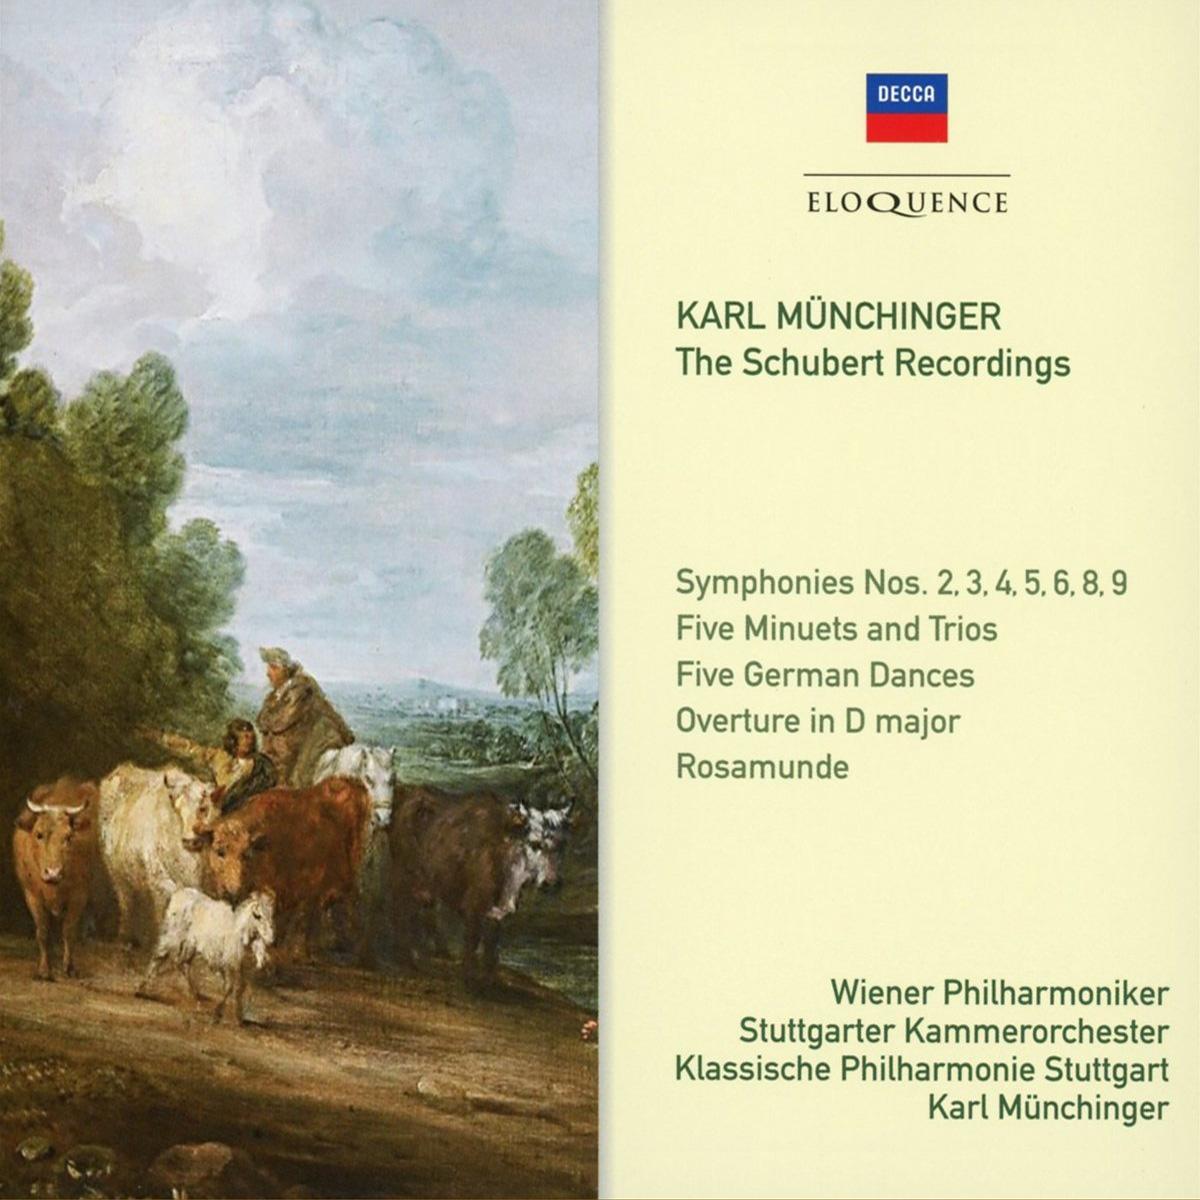 Ionarts: A Survey of Schubert Symphony Cycles